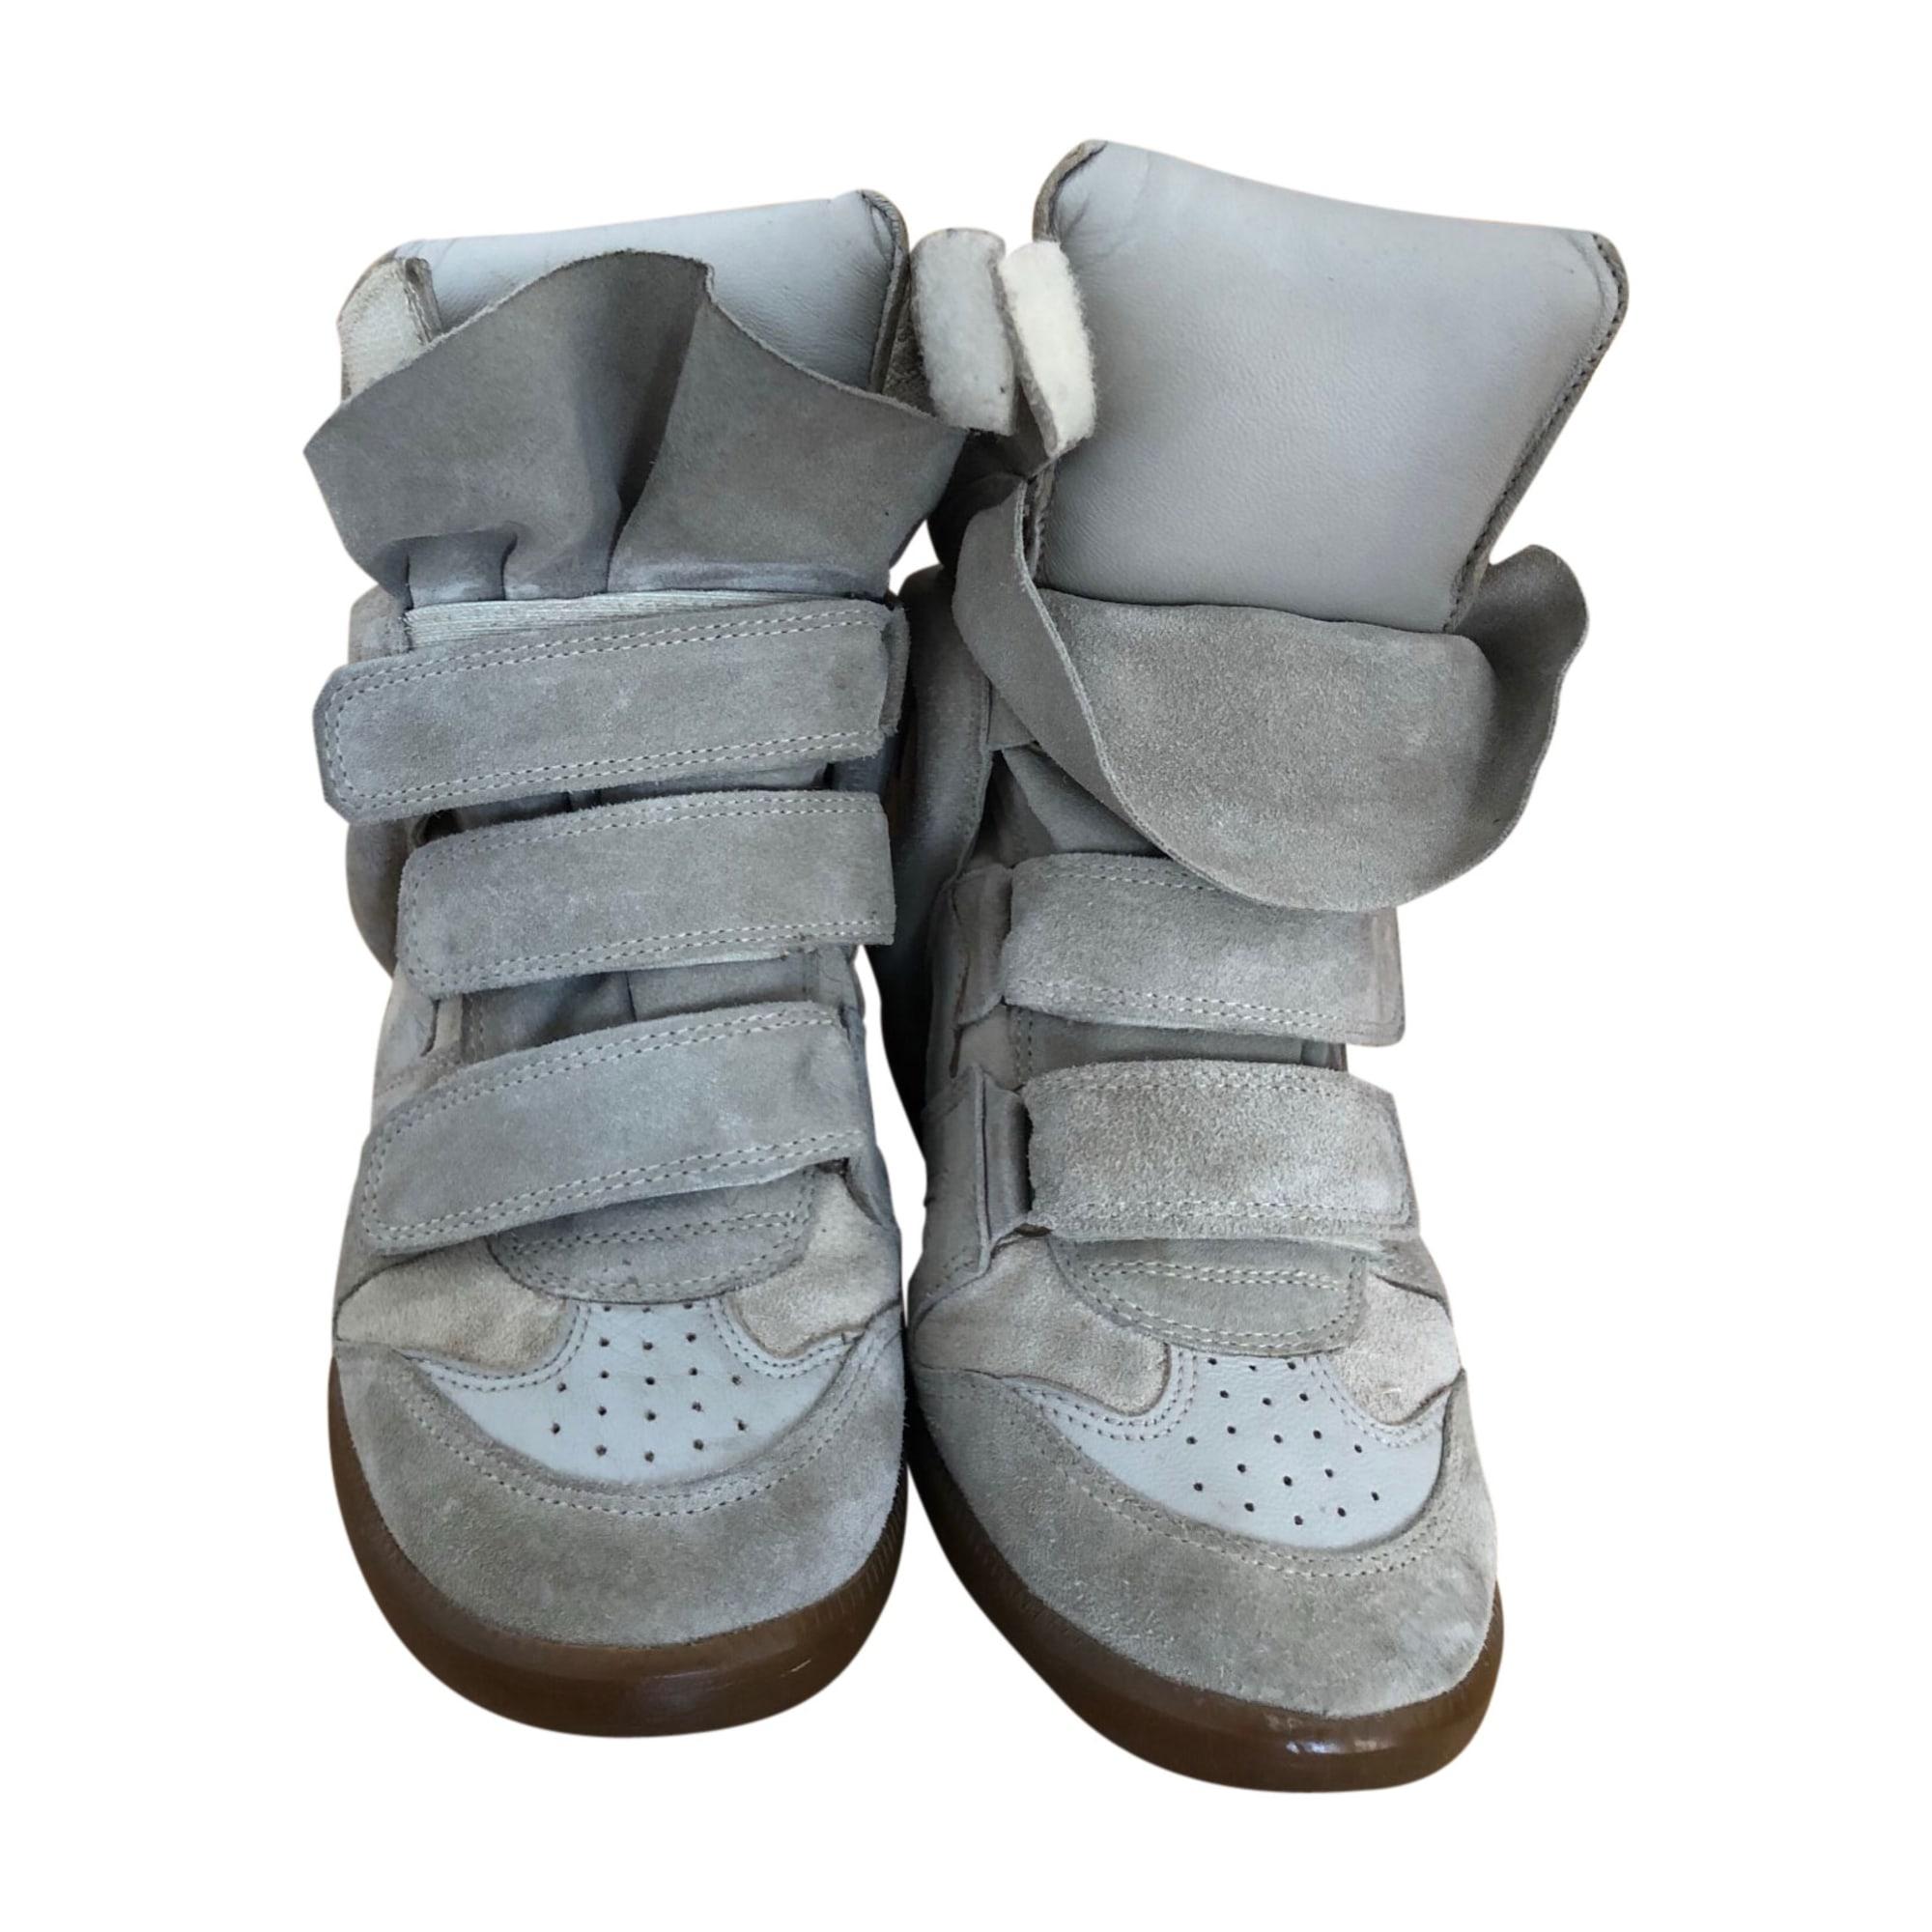 Sneakers ISABEL MARANT Beige, camel